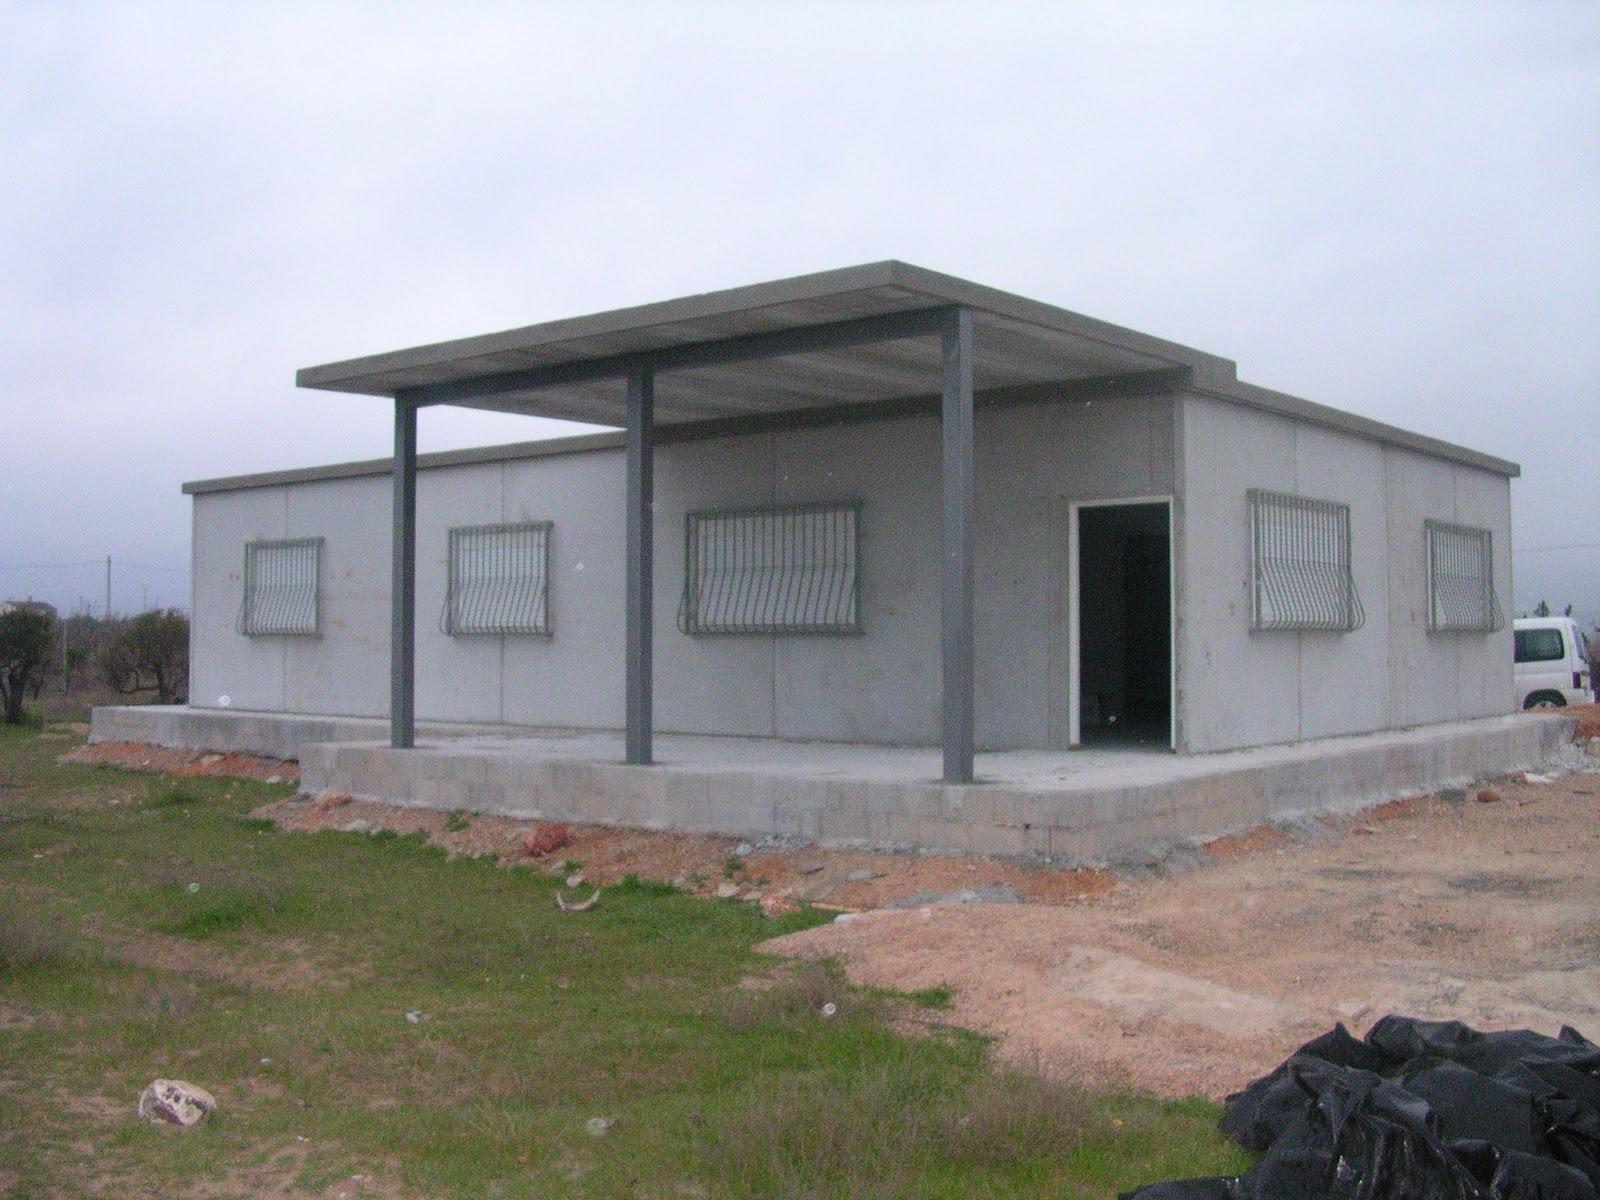 Casetas prefabricadas de hormigon riego casetas - Ofertas de casas prefabricadas de hormigon ...